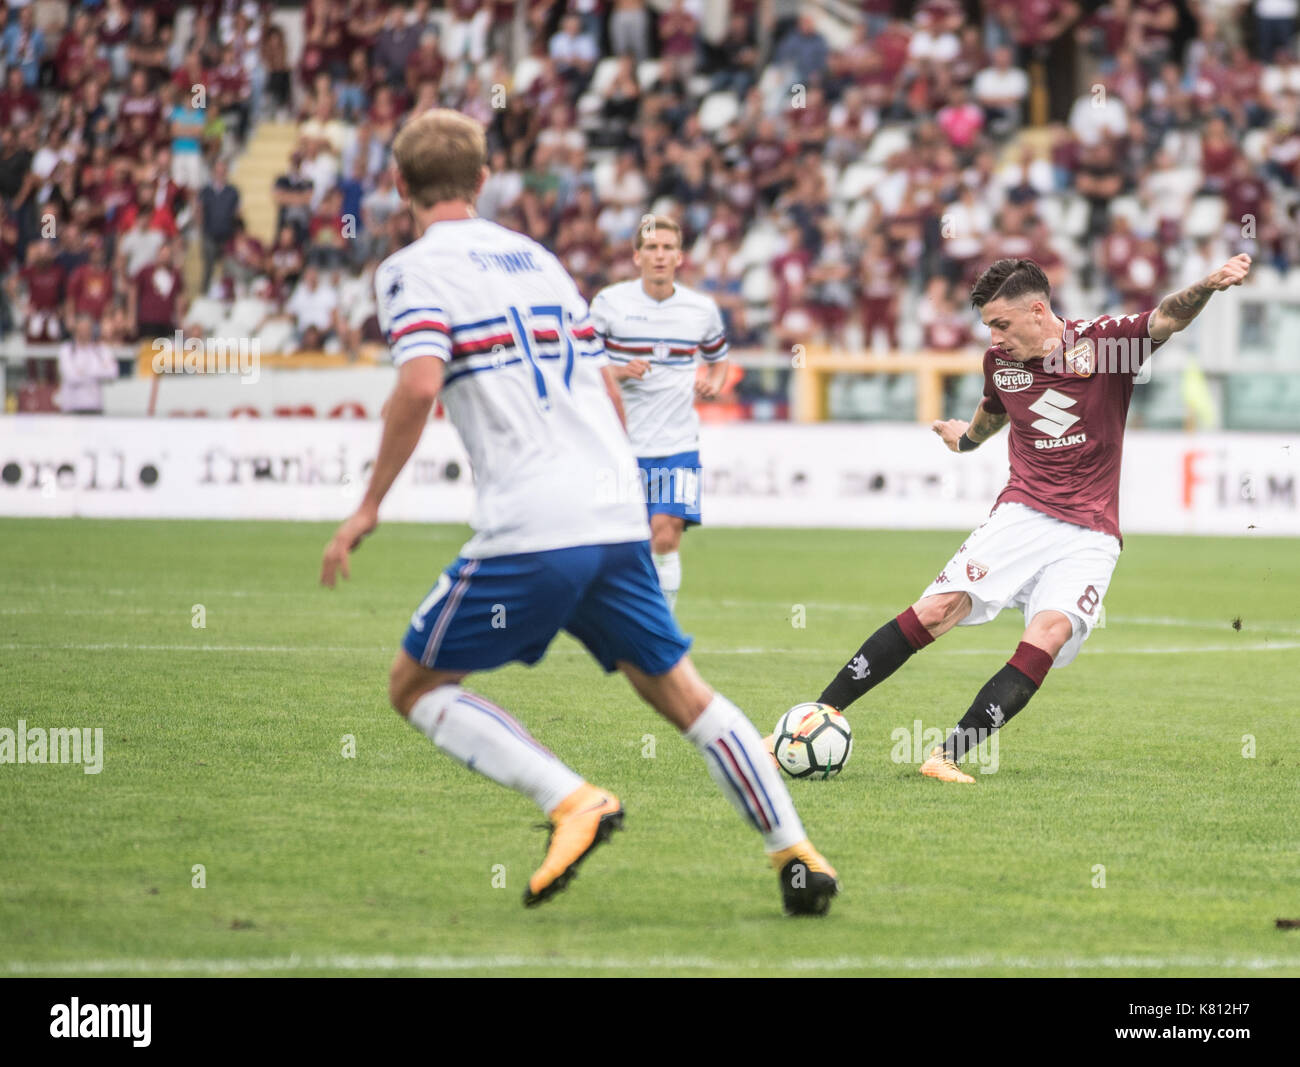 Duvàn Zapata celebrates during the serie a match Torino vs Sampdoria - Stock Image